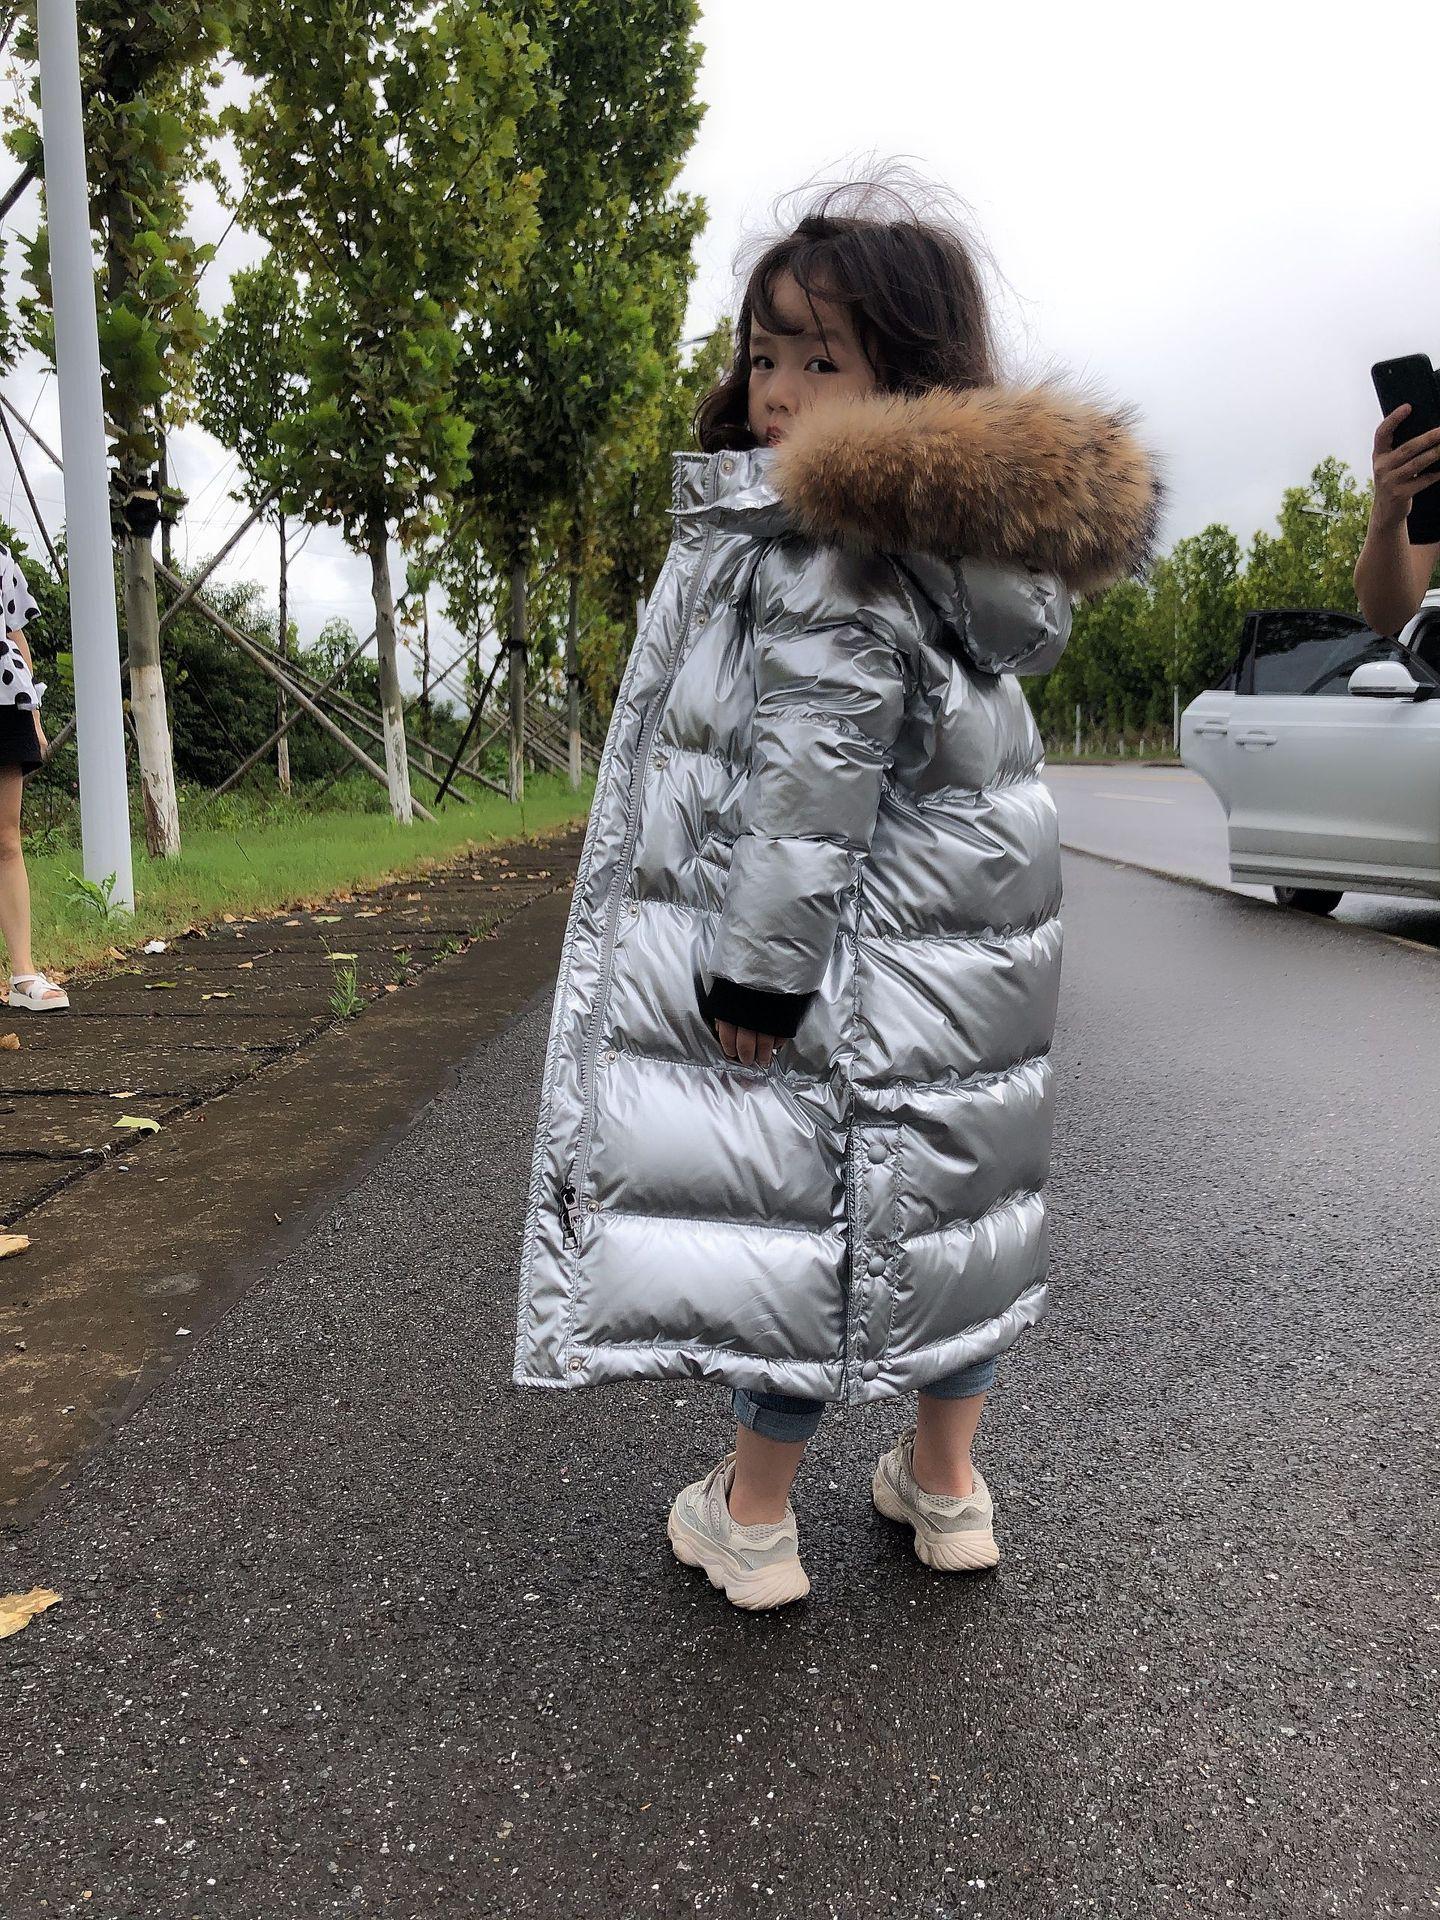 Olekid 2020 russo inverno para baixo jaqueta para meninas à prova dwaterproof água brilhante quente meninas casaco de inverno 5-14 anos adolescente parka snowsuit